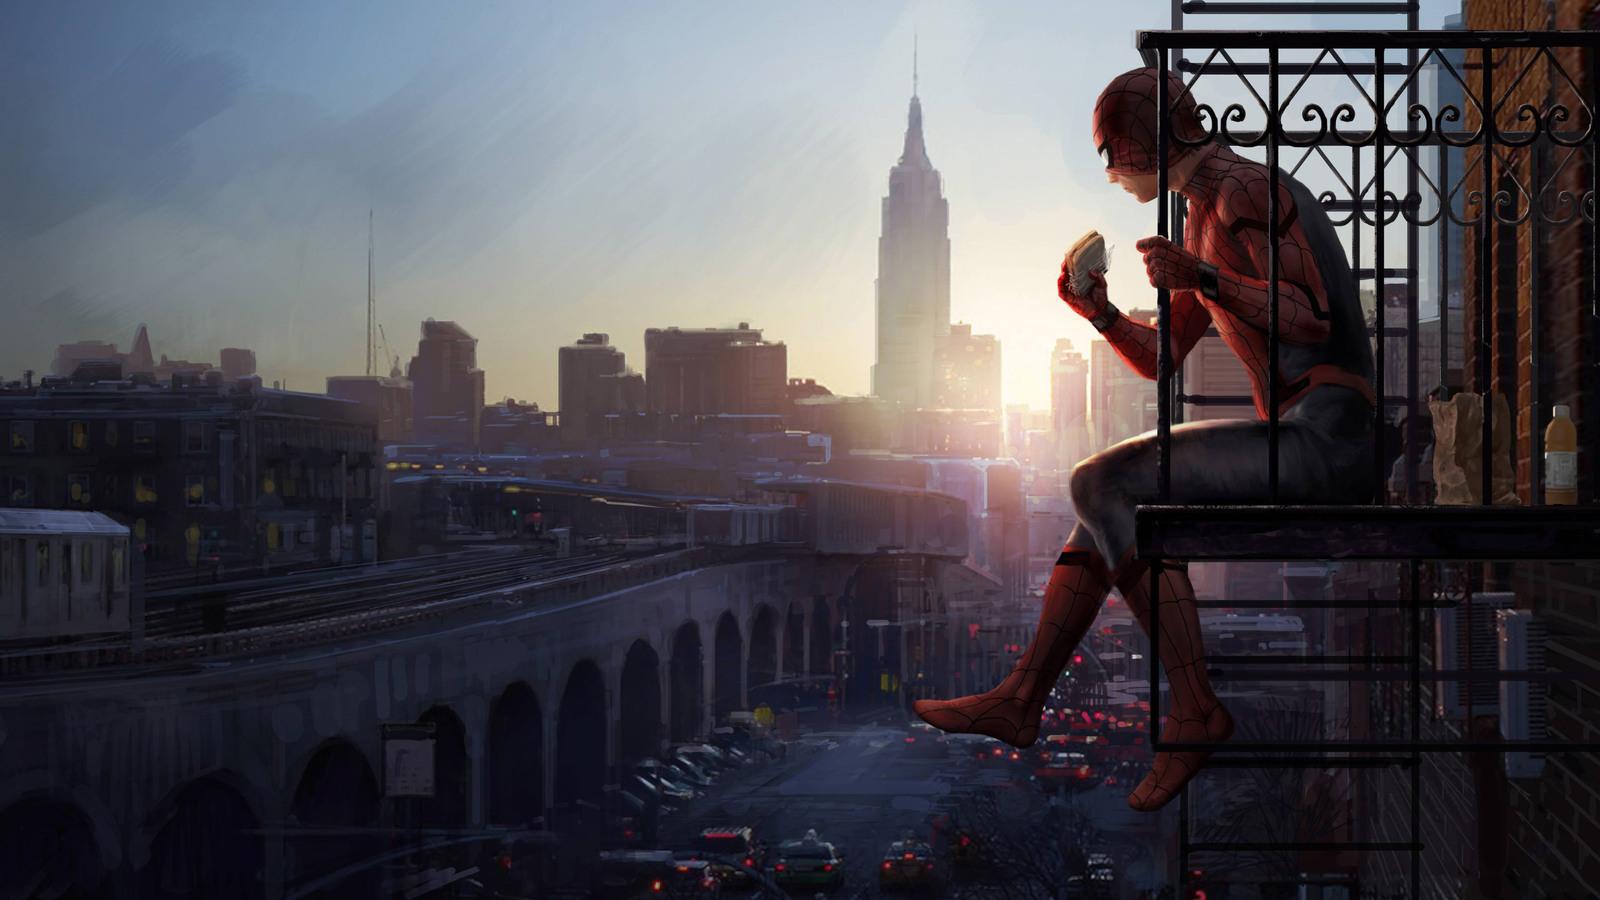 spiderman-homecoming-artwork-5k-p0.jpg